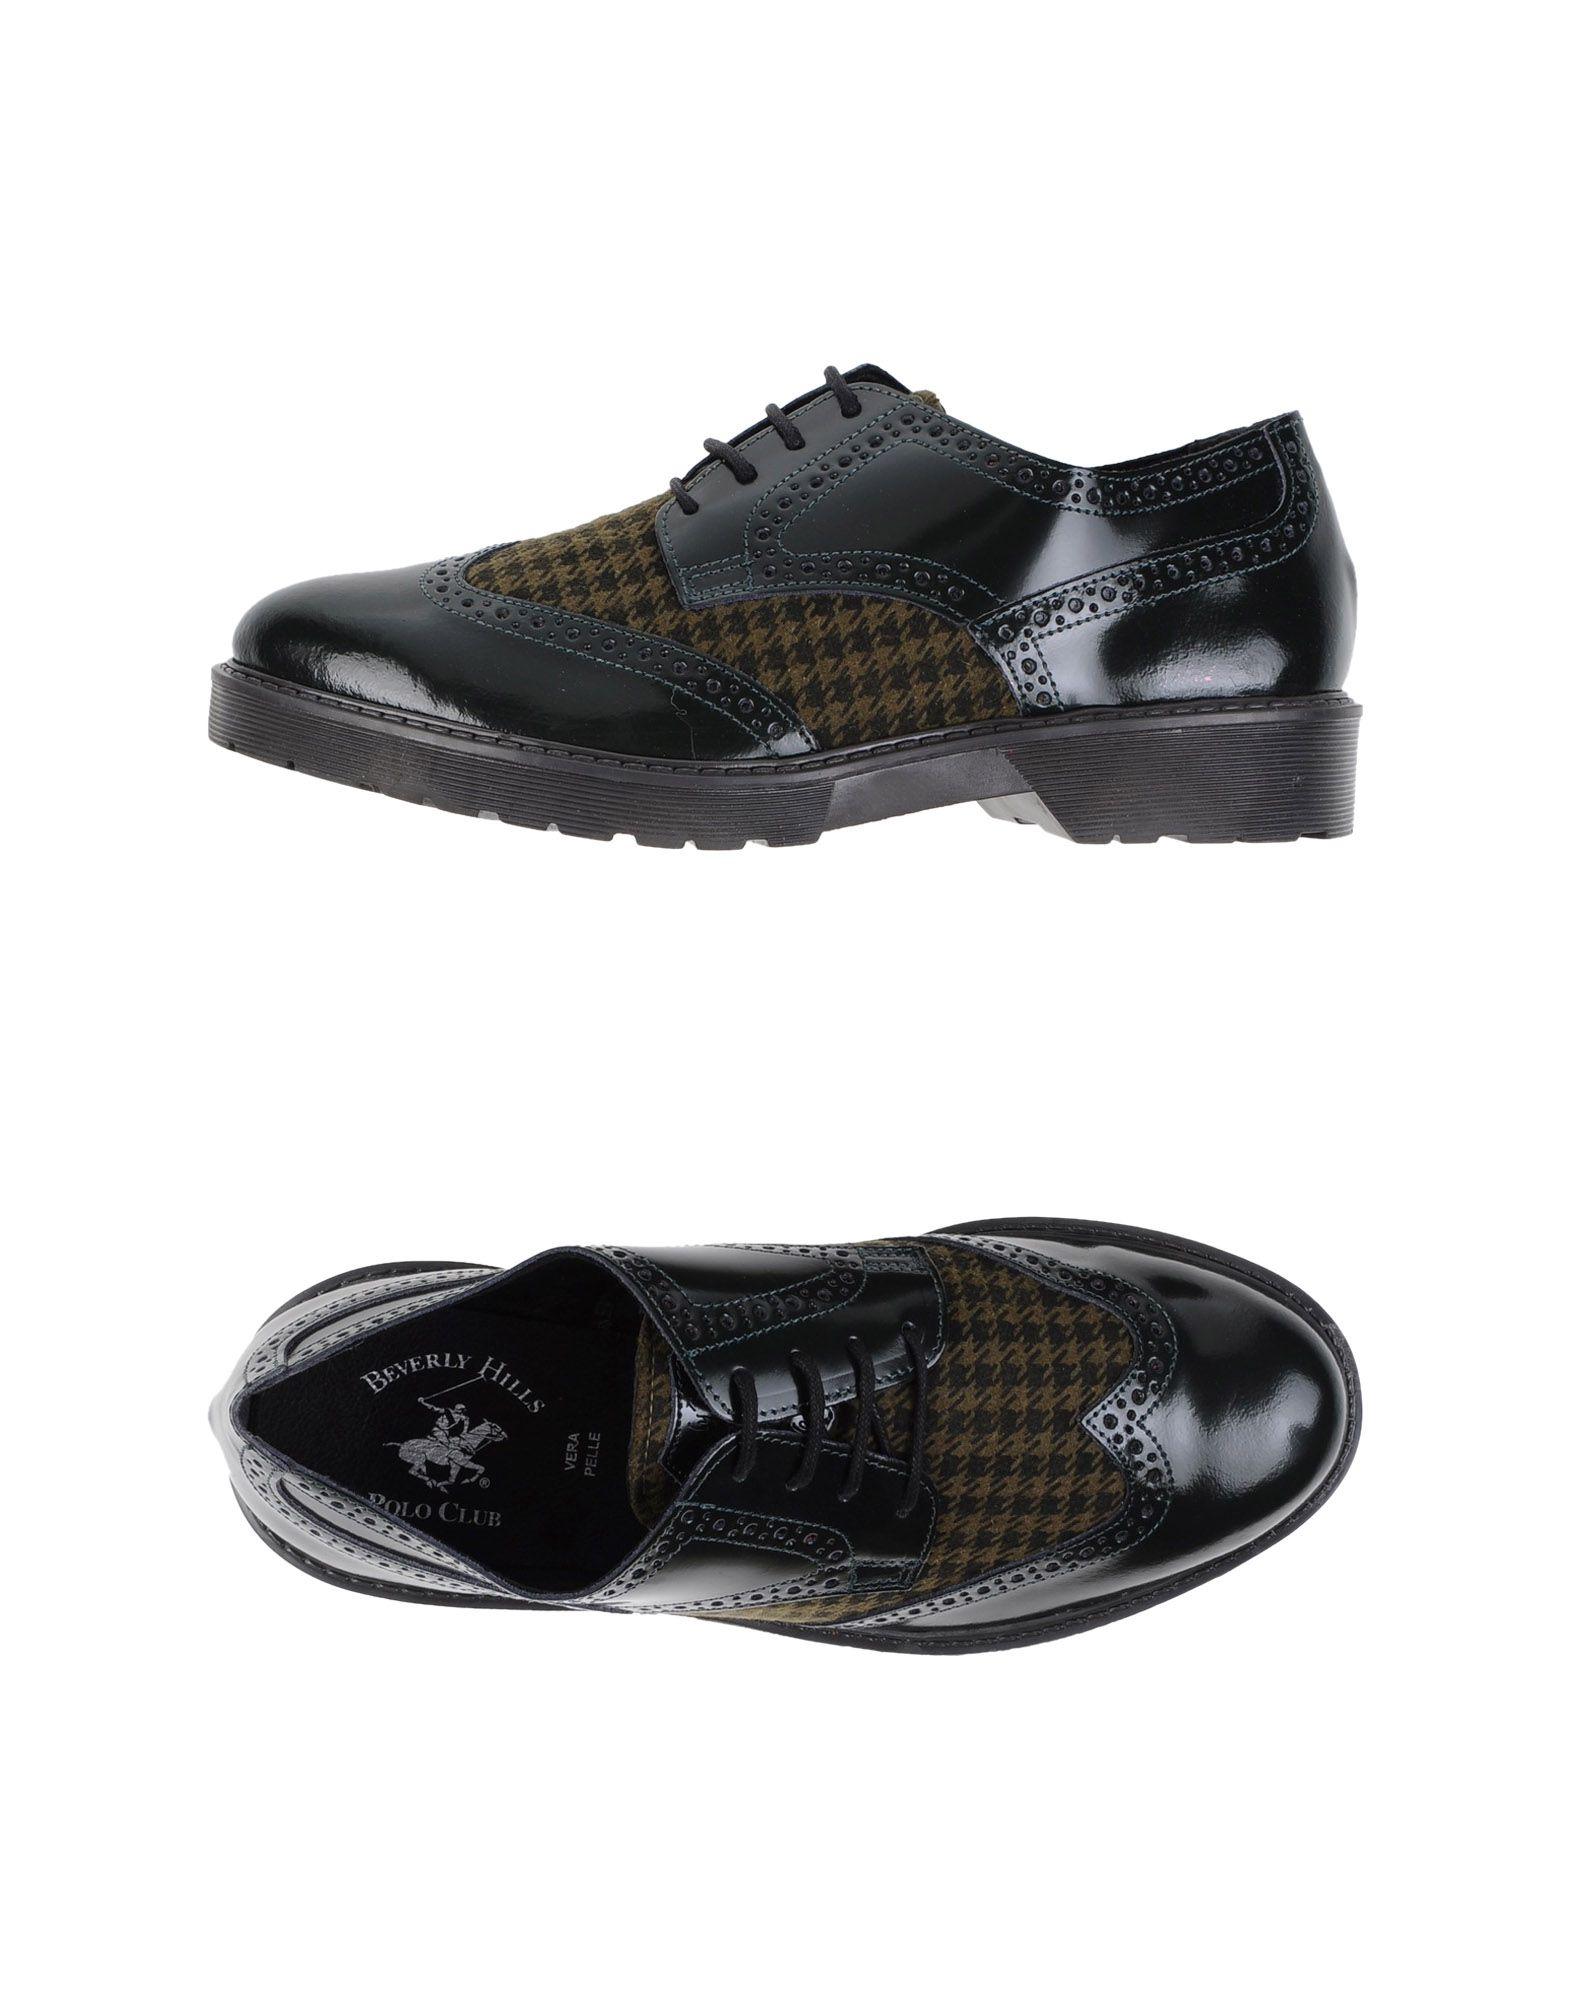 BEVERLY HILLS POLO CLUB Обувь на шнурках bag beverly hills polo club bag